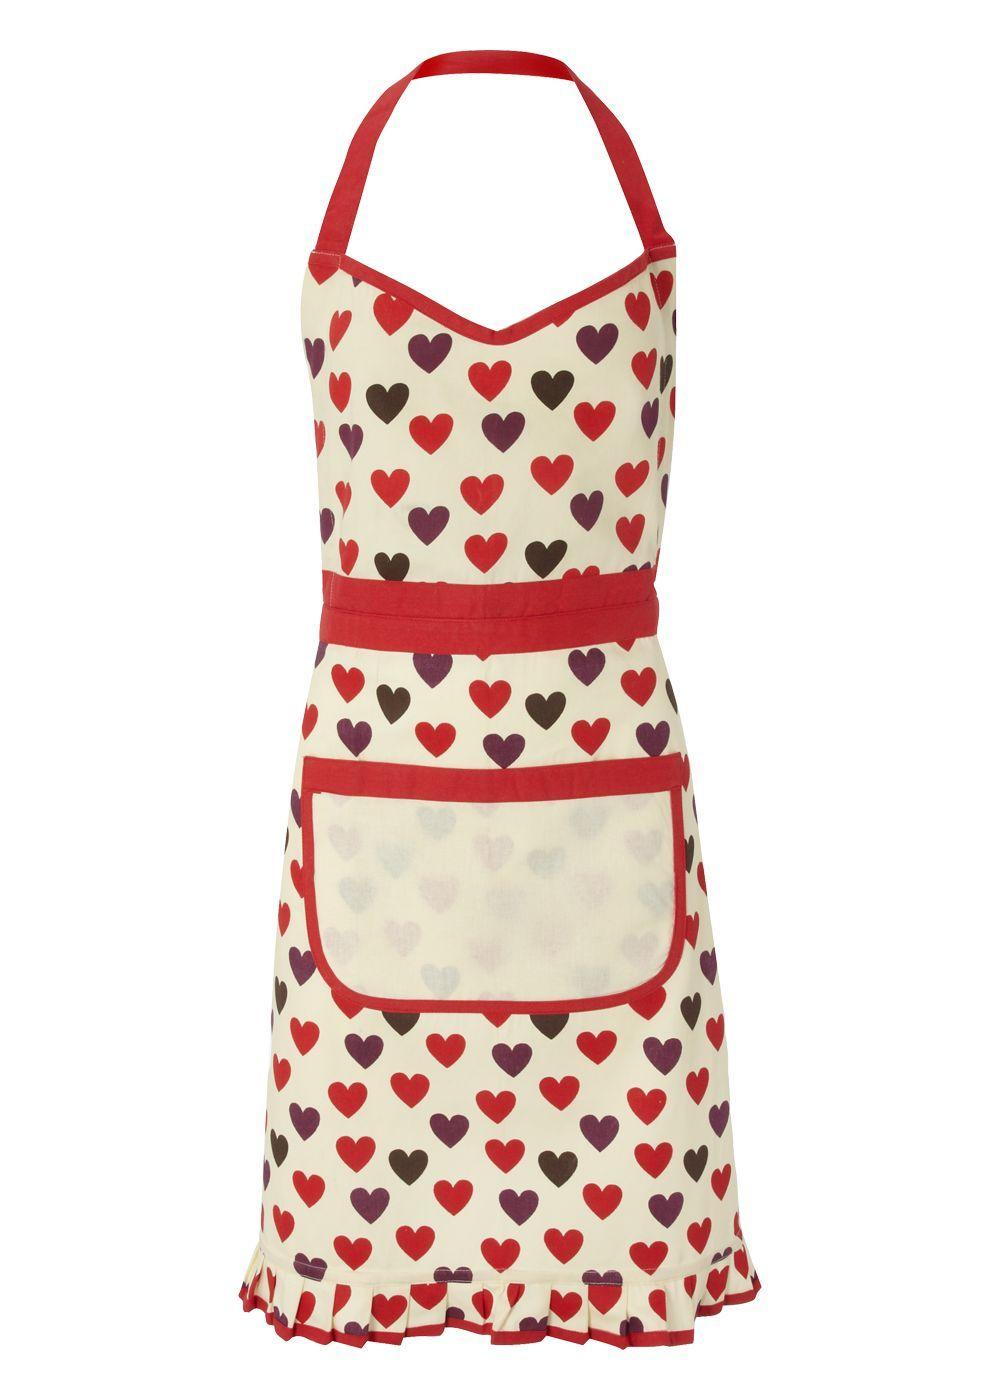 White frilly apron nz - Matalan Heart Apron